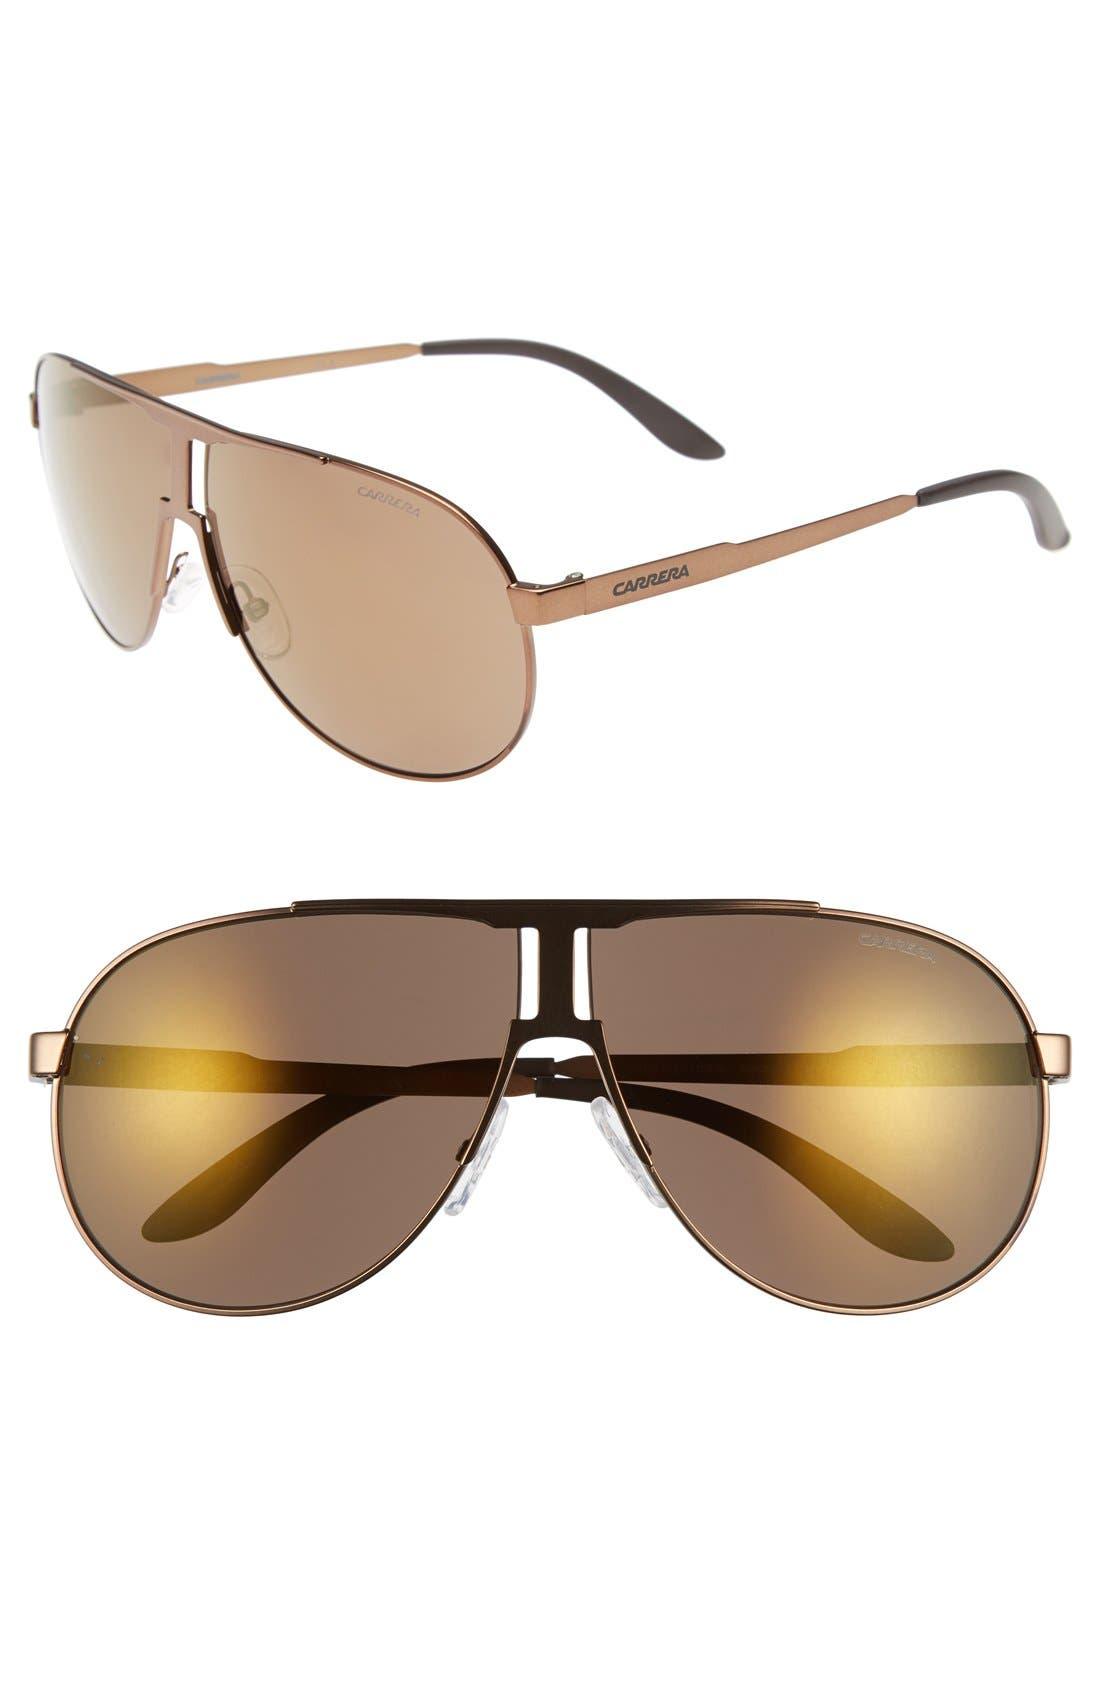 64mm Aviator Sunglasses,                         Main,                         color, 202